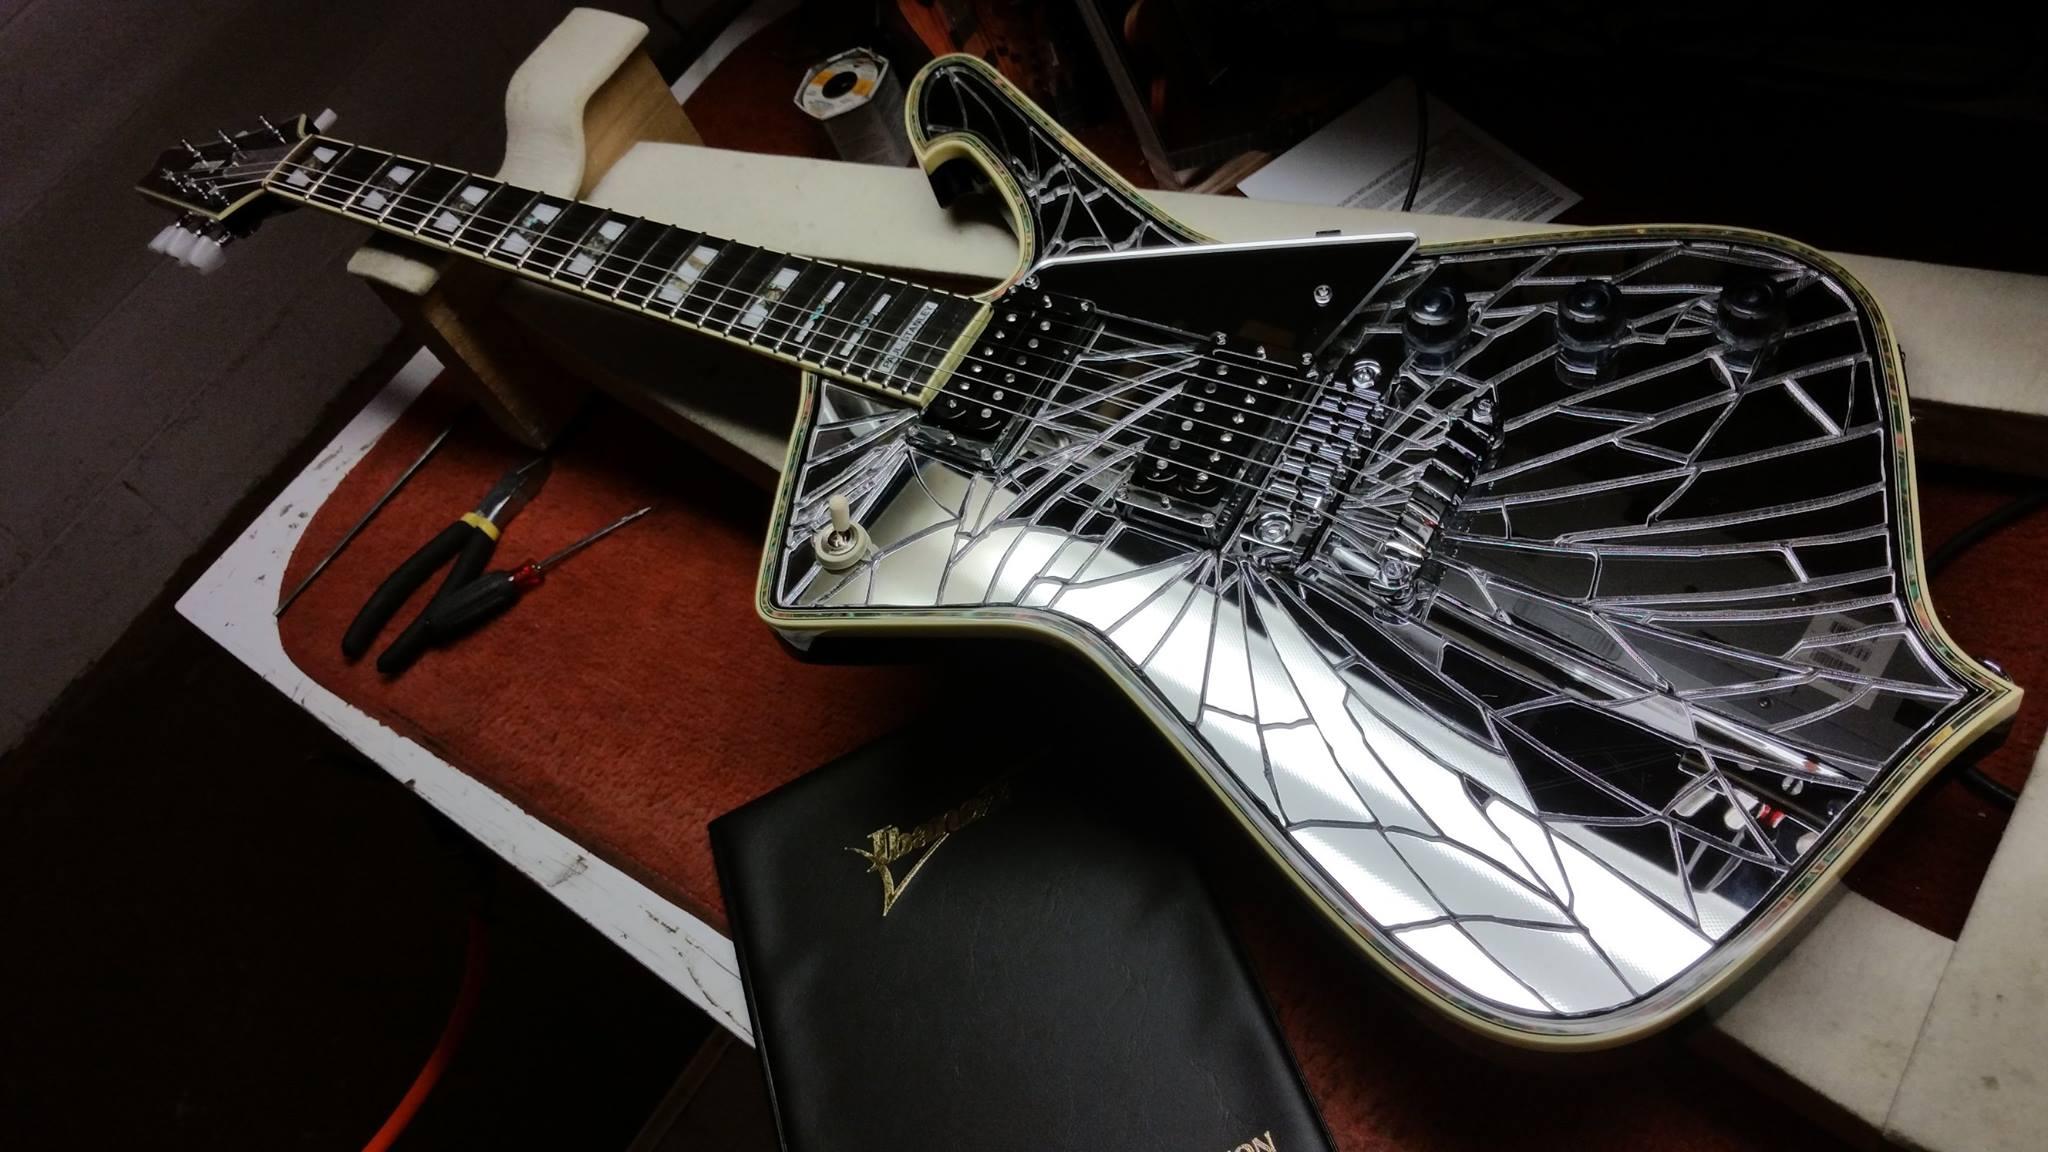 new signature model cracked mirror guitar paul stanley. Black Bedroom Furniture Sets. Home Design Ideas